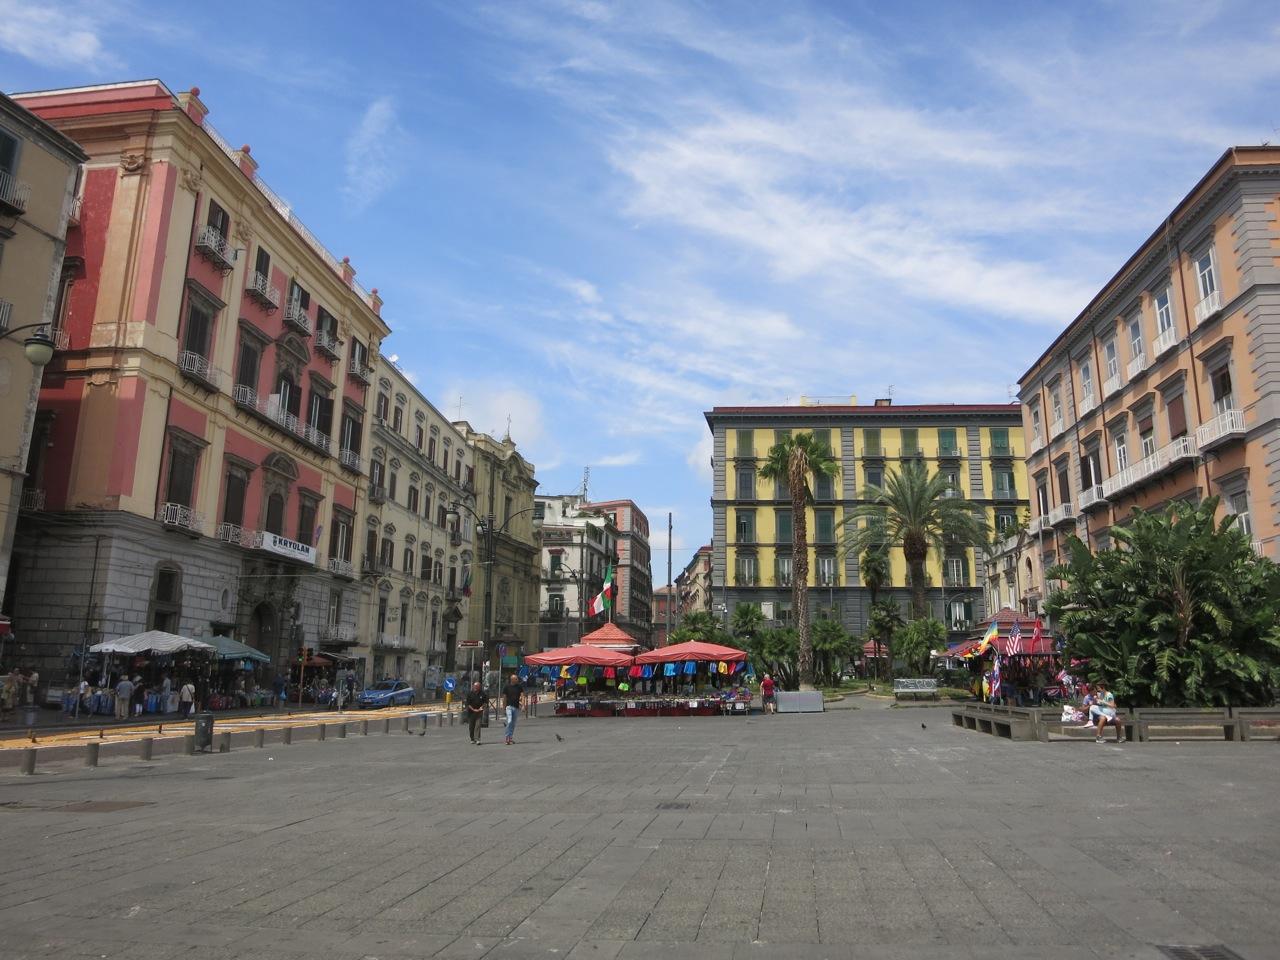 Napoli 1-08